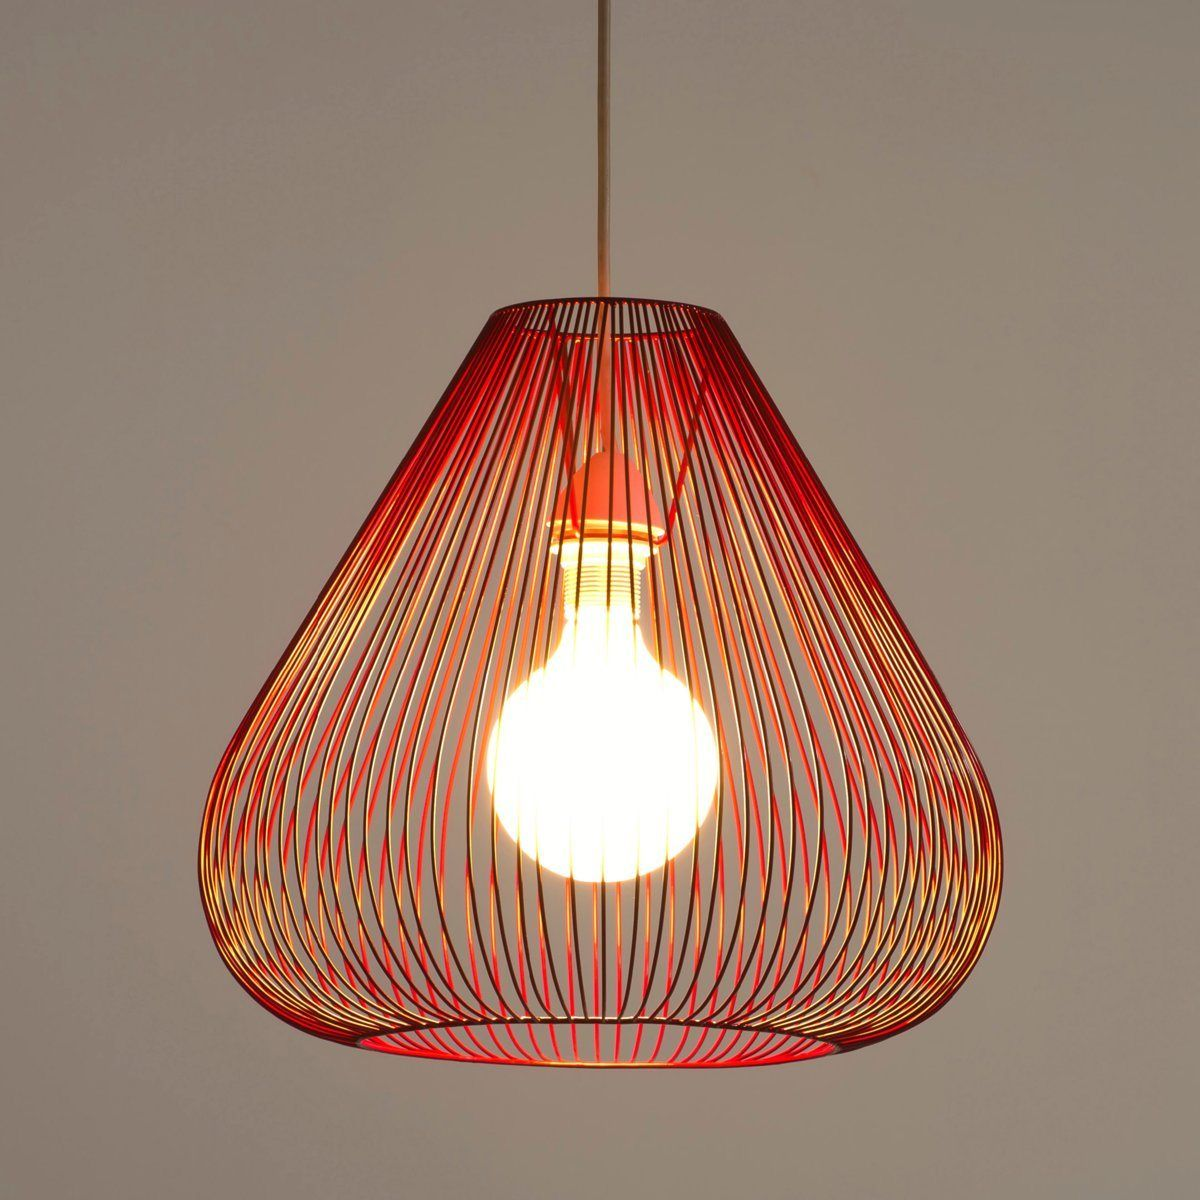 suspension filaire non lectrifi e autre lamp. Black Bedroom Furniture Sets. Home Design Ideas